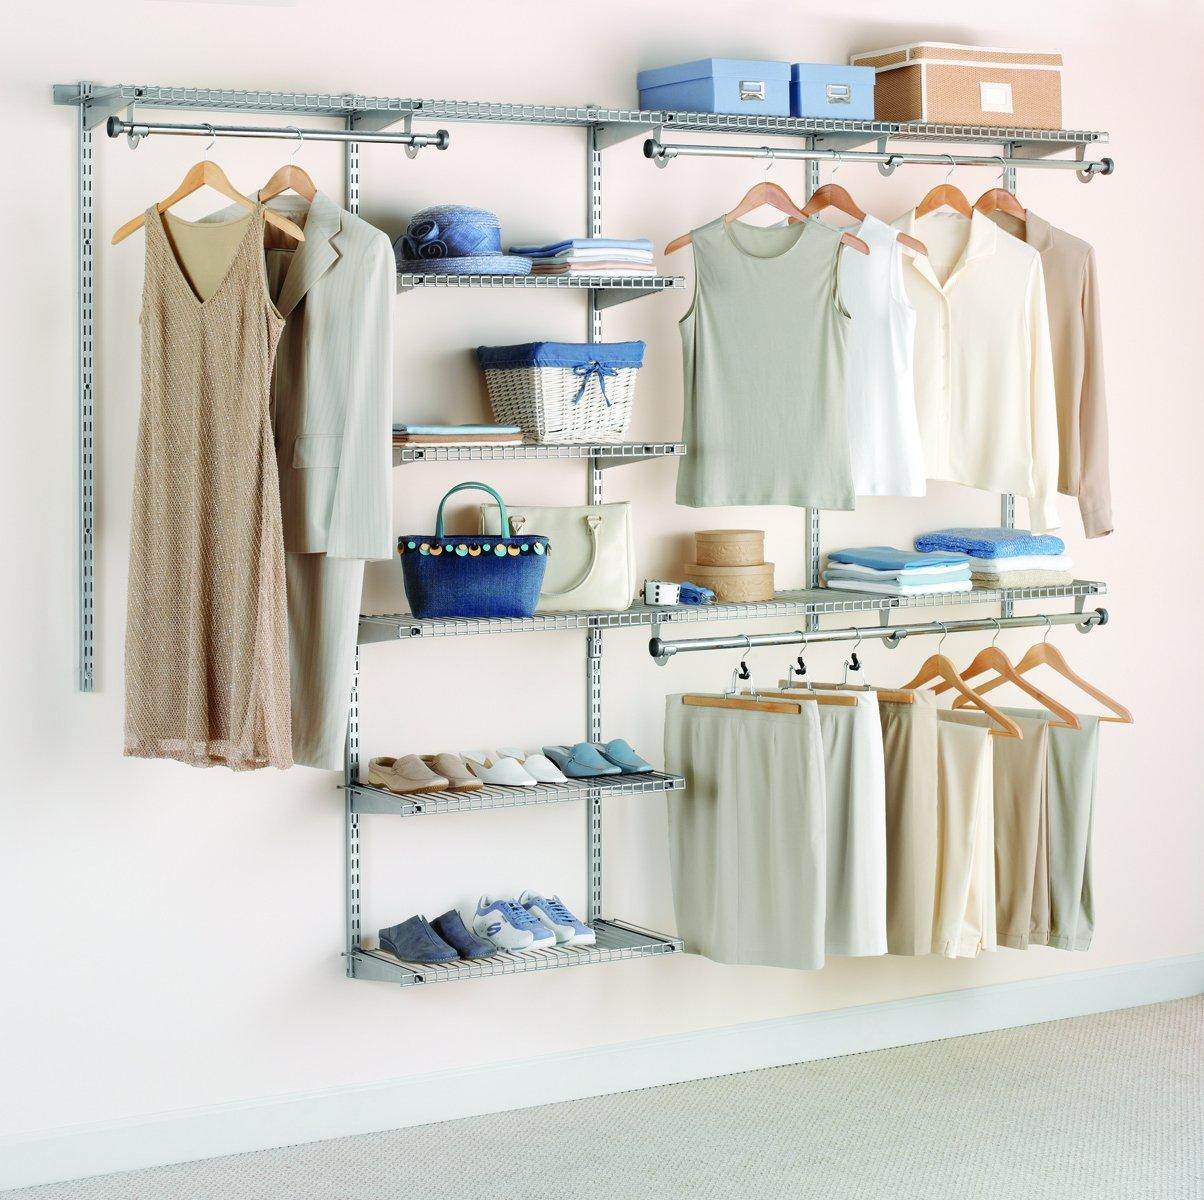 Prime Members: Rubbermaid Configurations 4-8' Custom Closet Kit  $70 + Free Shipping